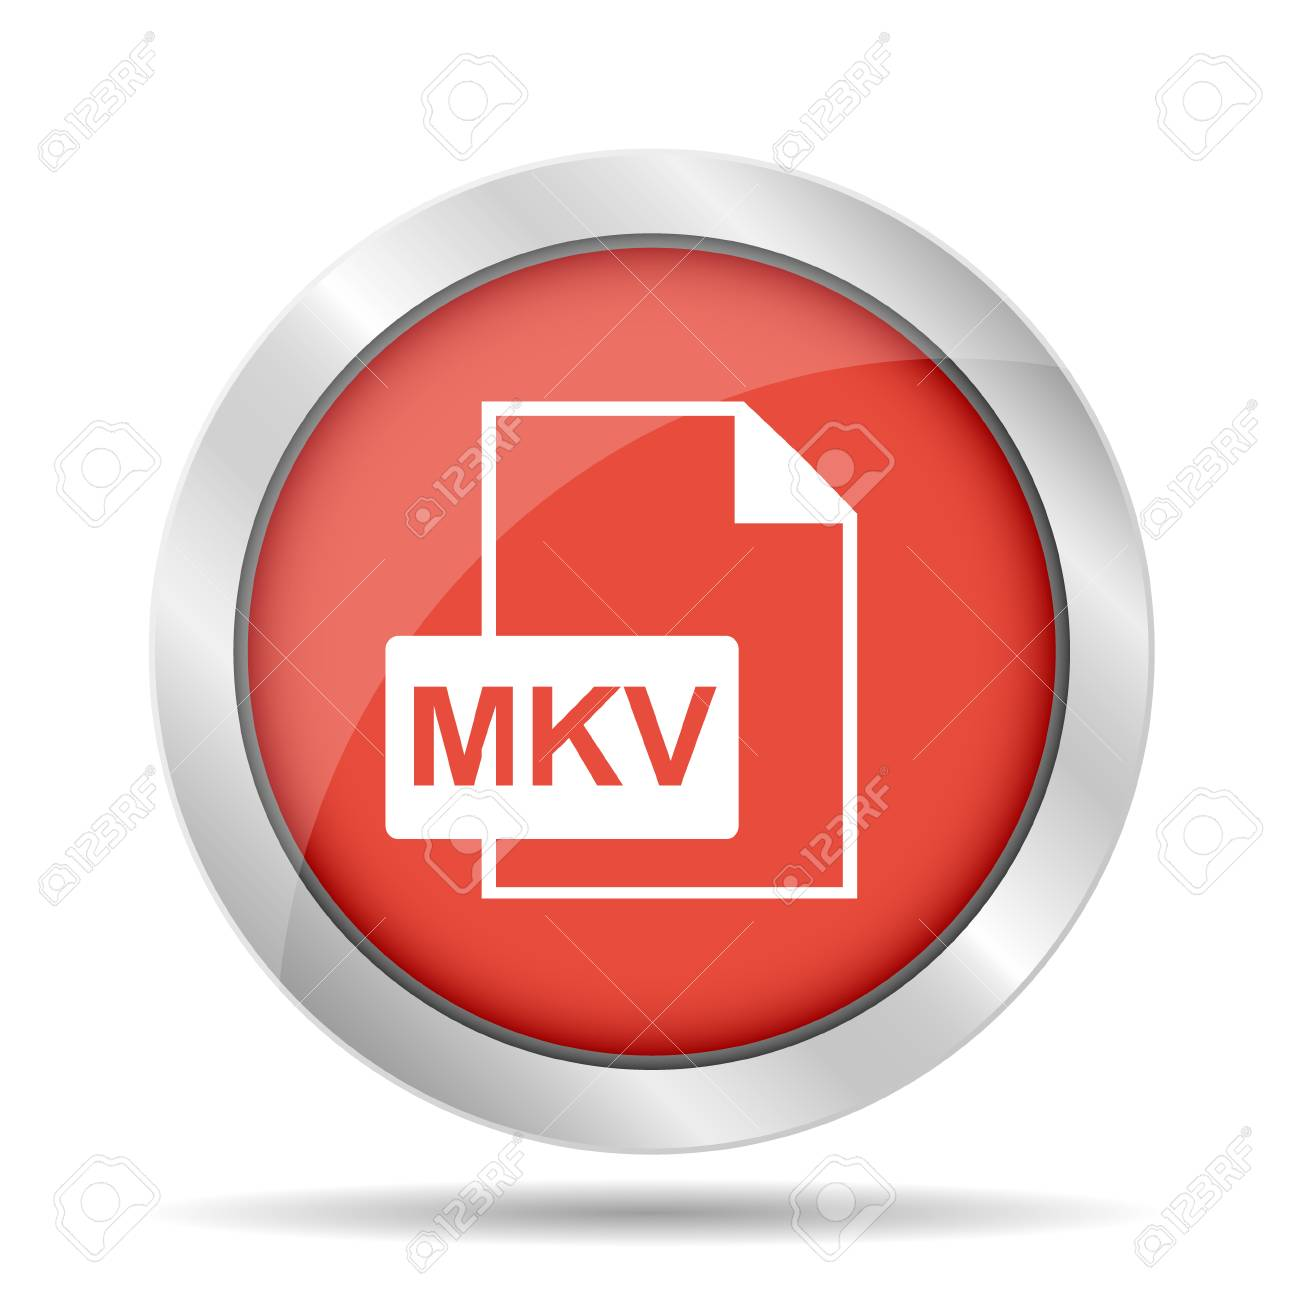 mkv file icon  Flat vector illustrator